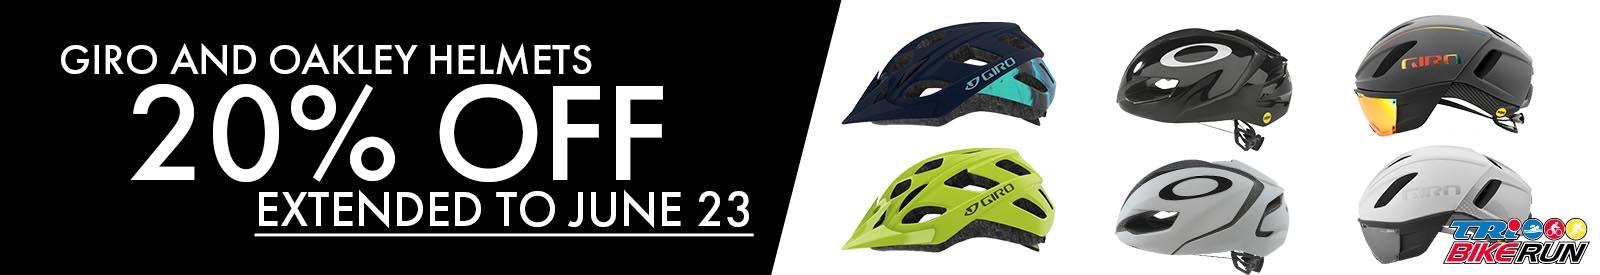 Helmet Sale 20% off till june 16